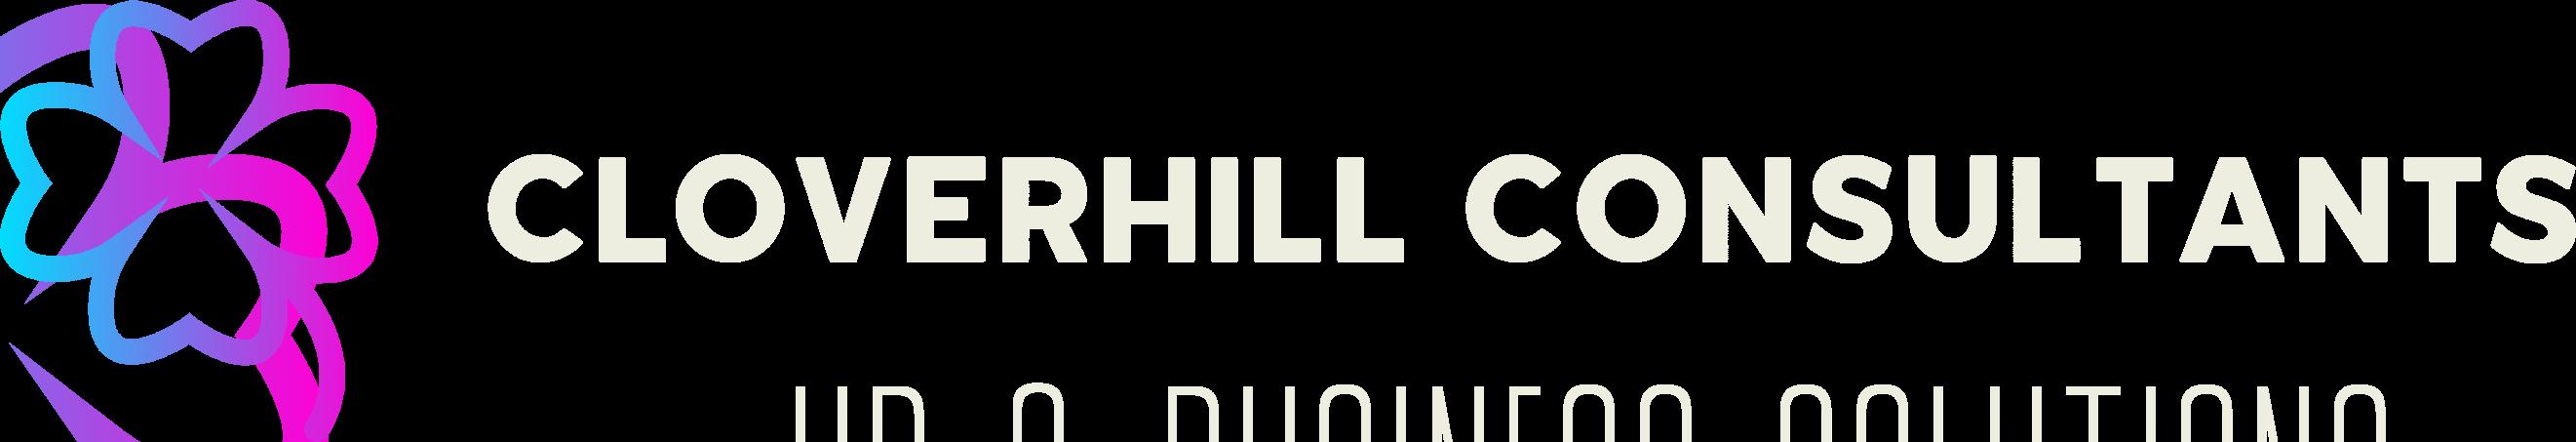 Cloverhill Consultants